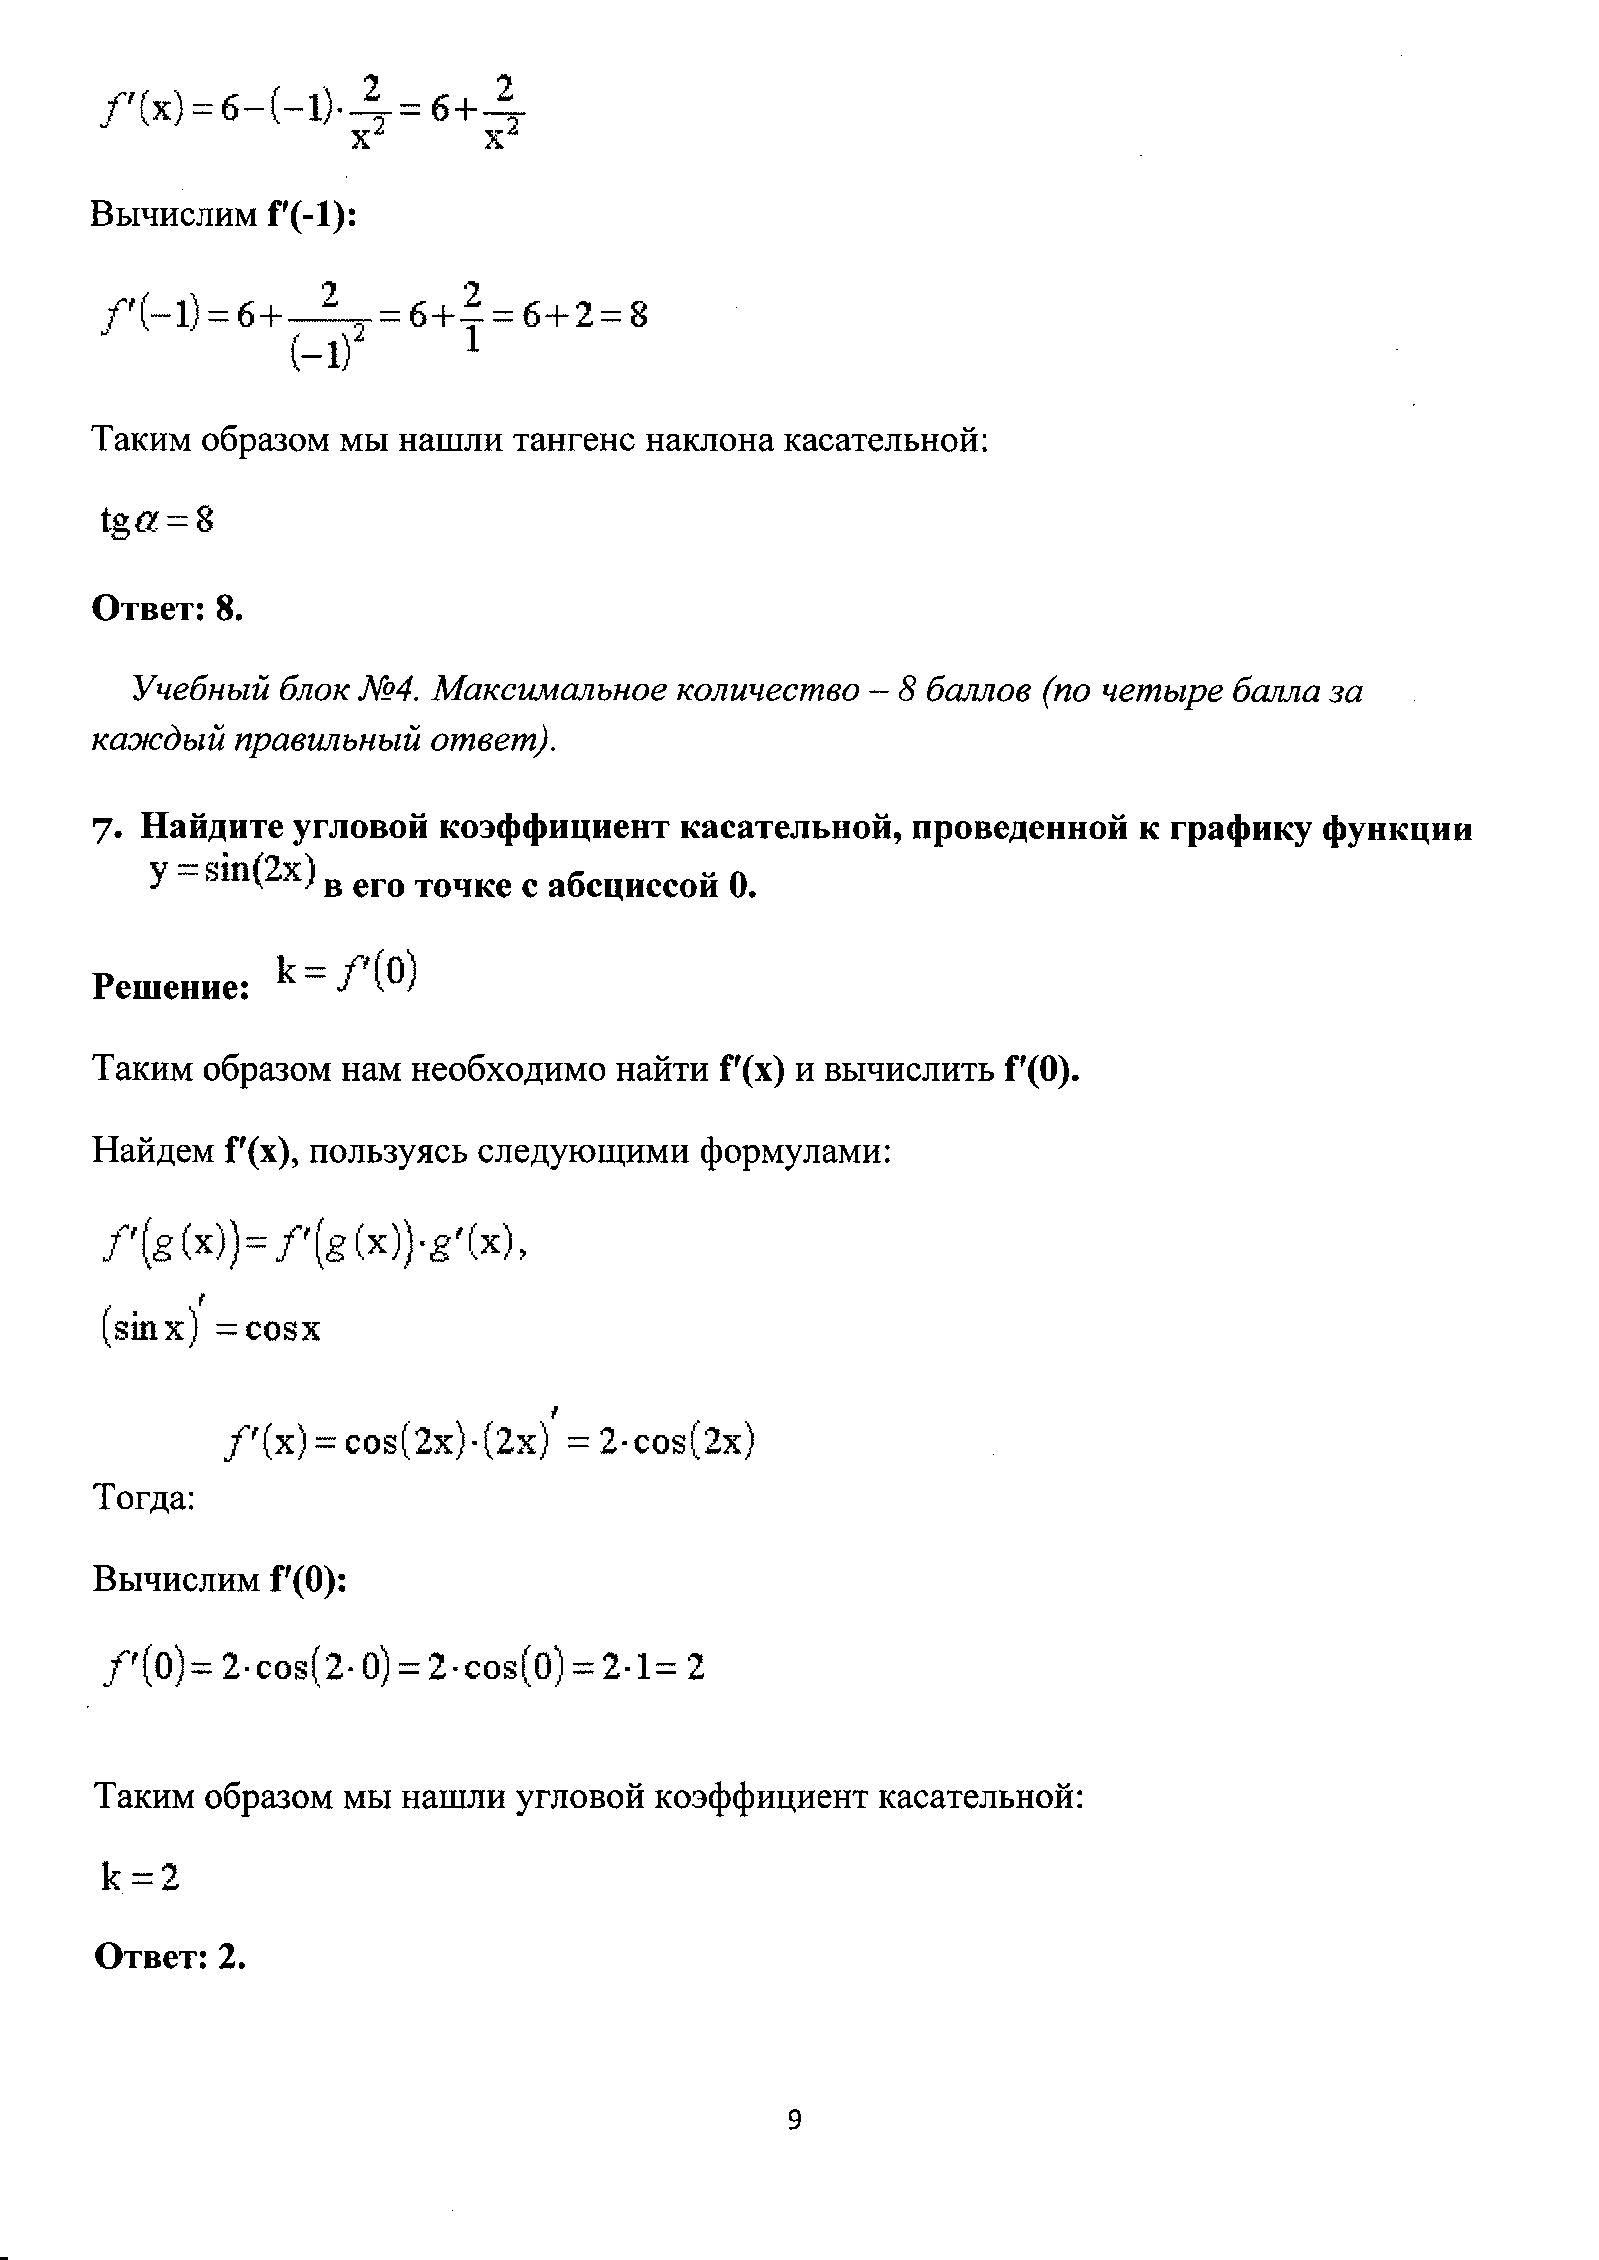 C:\Documents and Settings\Юлия\Мои документы\Мои рисунки\MP Navigator EX\2012_02_20\IMG_0009.tif